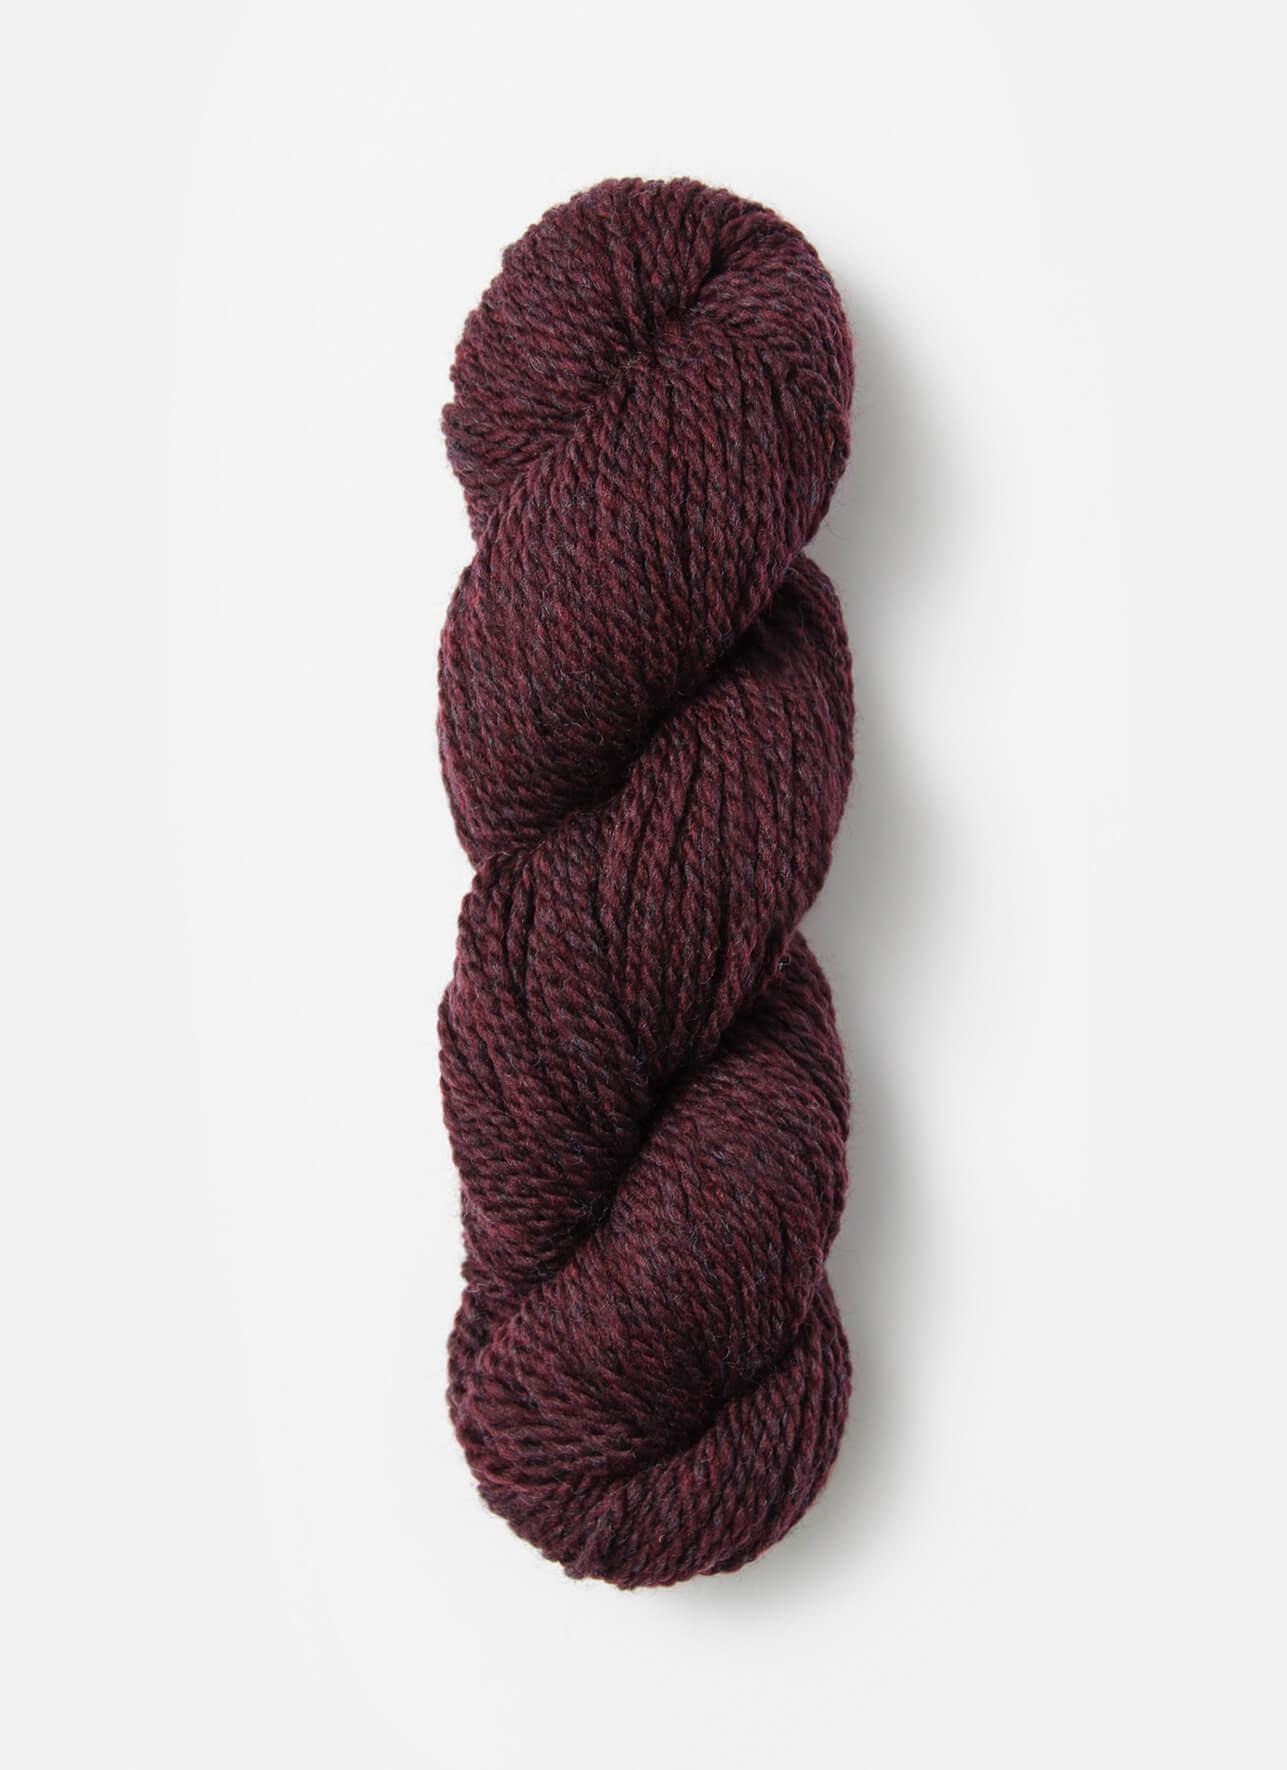 No. 1314: Deep Velvet